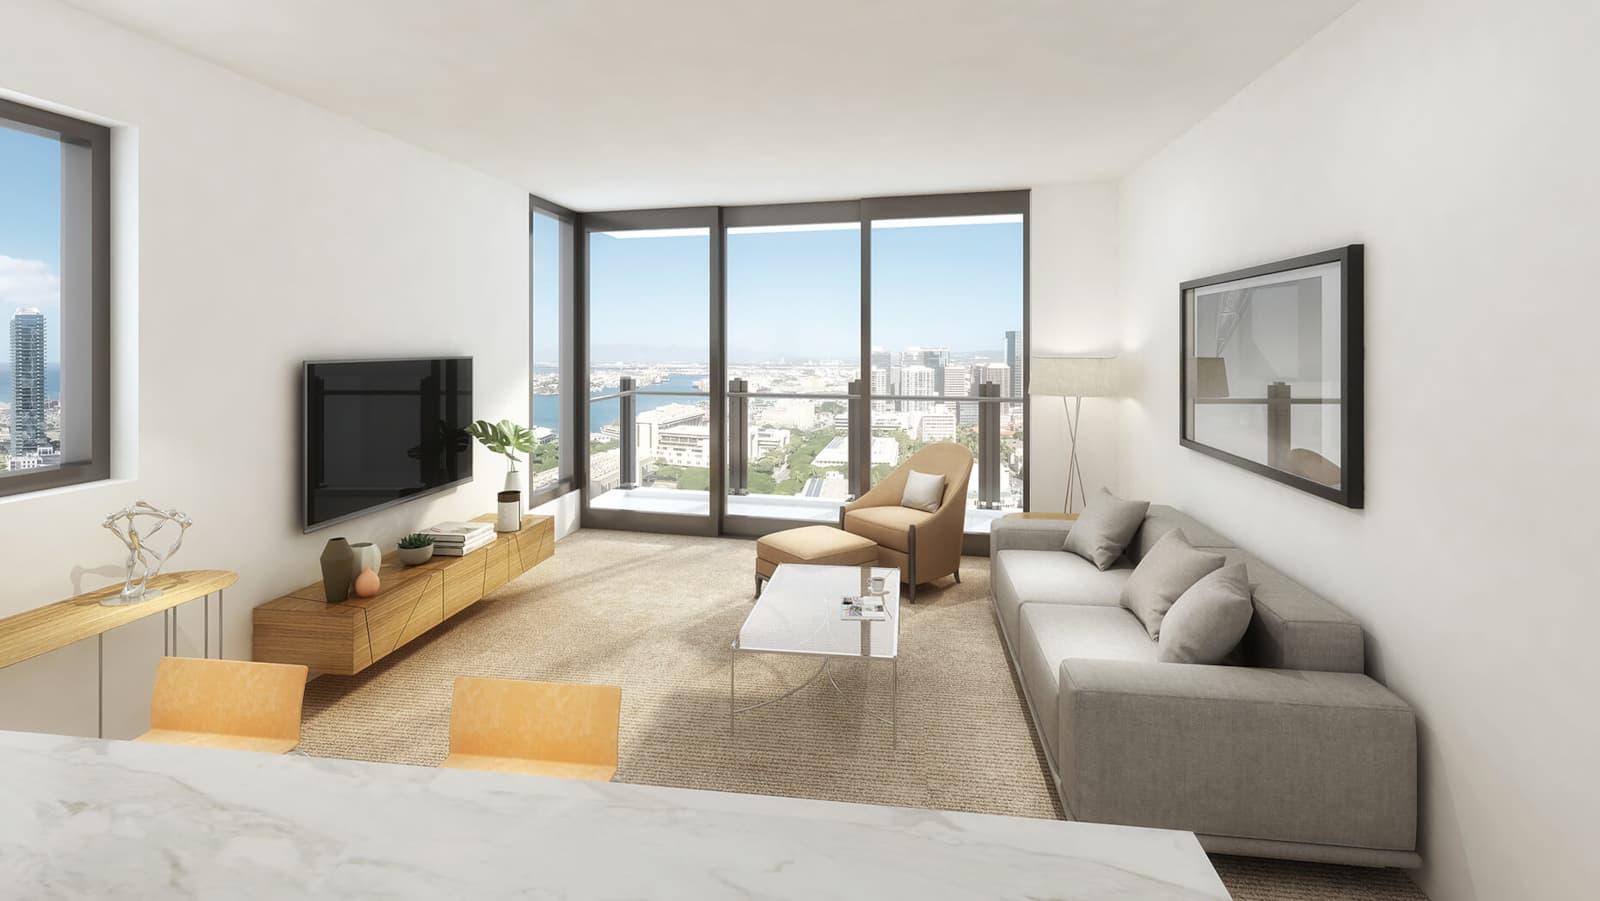 Ililani Living Room Mockup